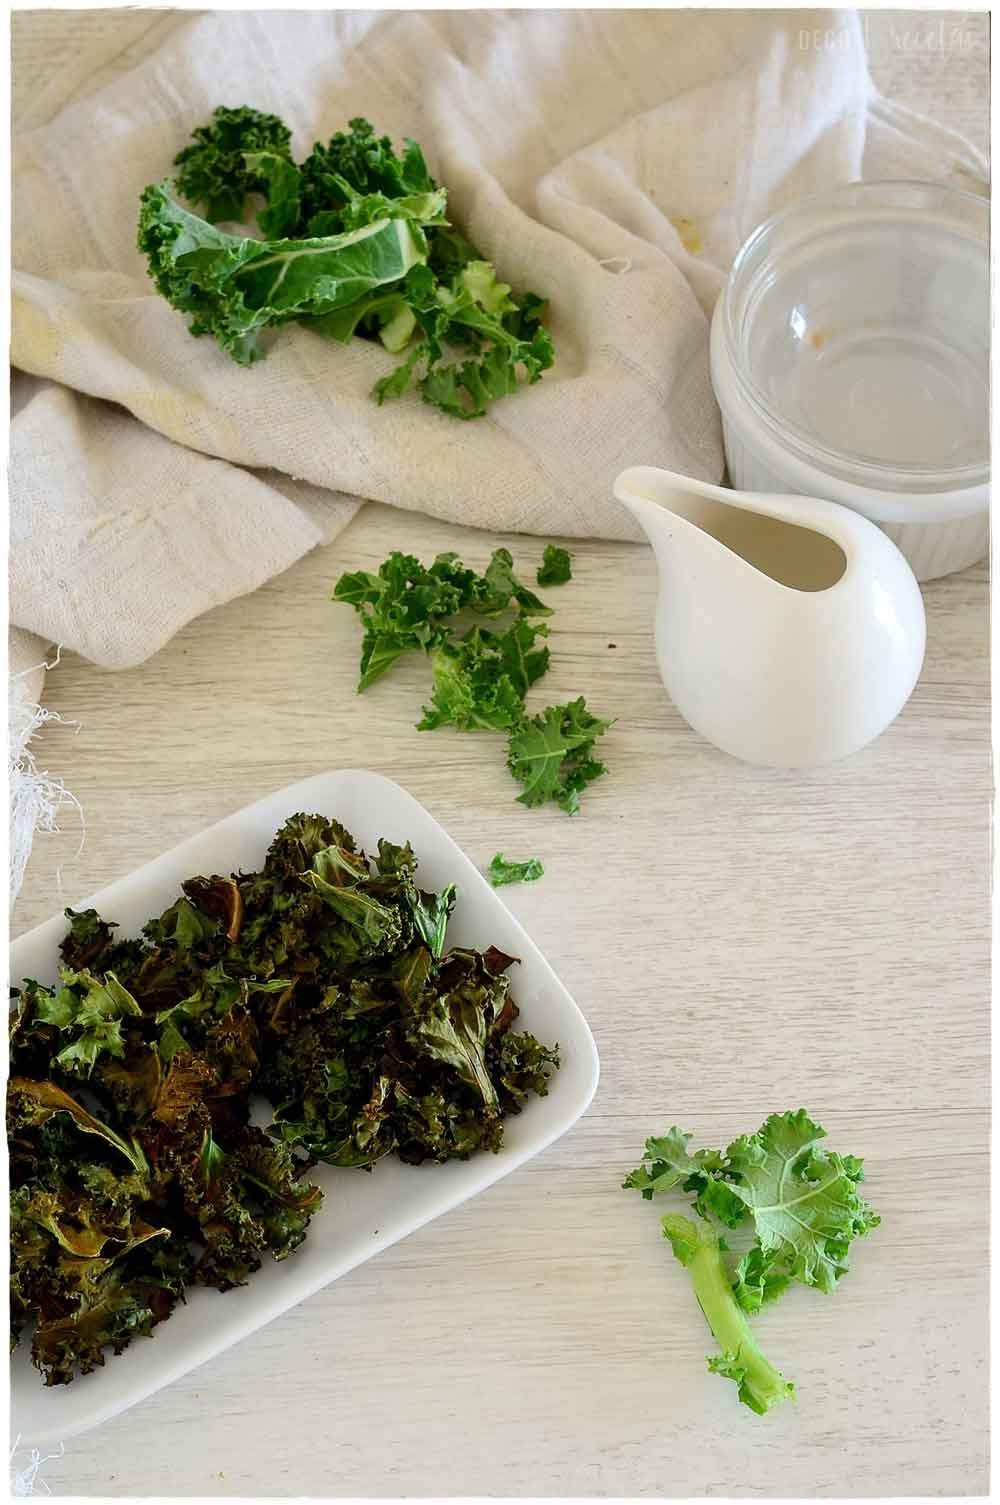 Crema de col kale